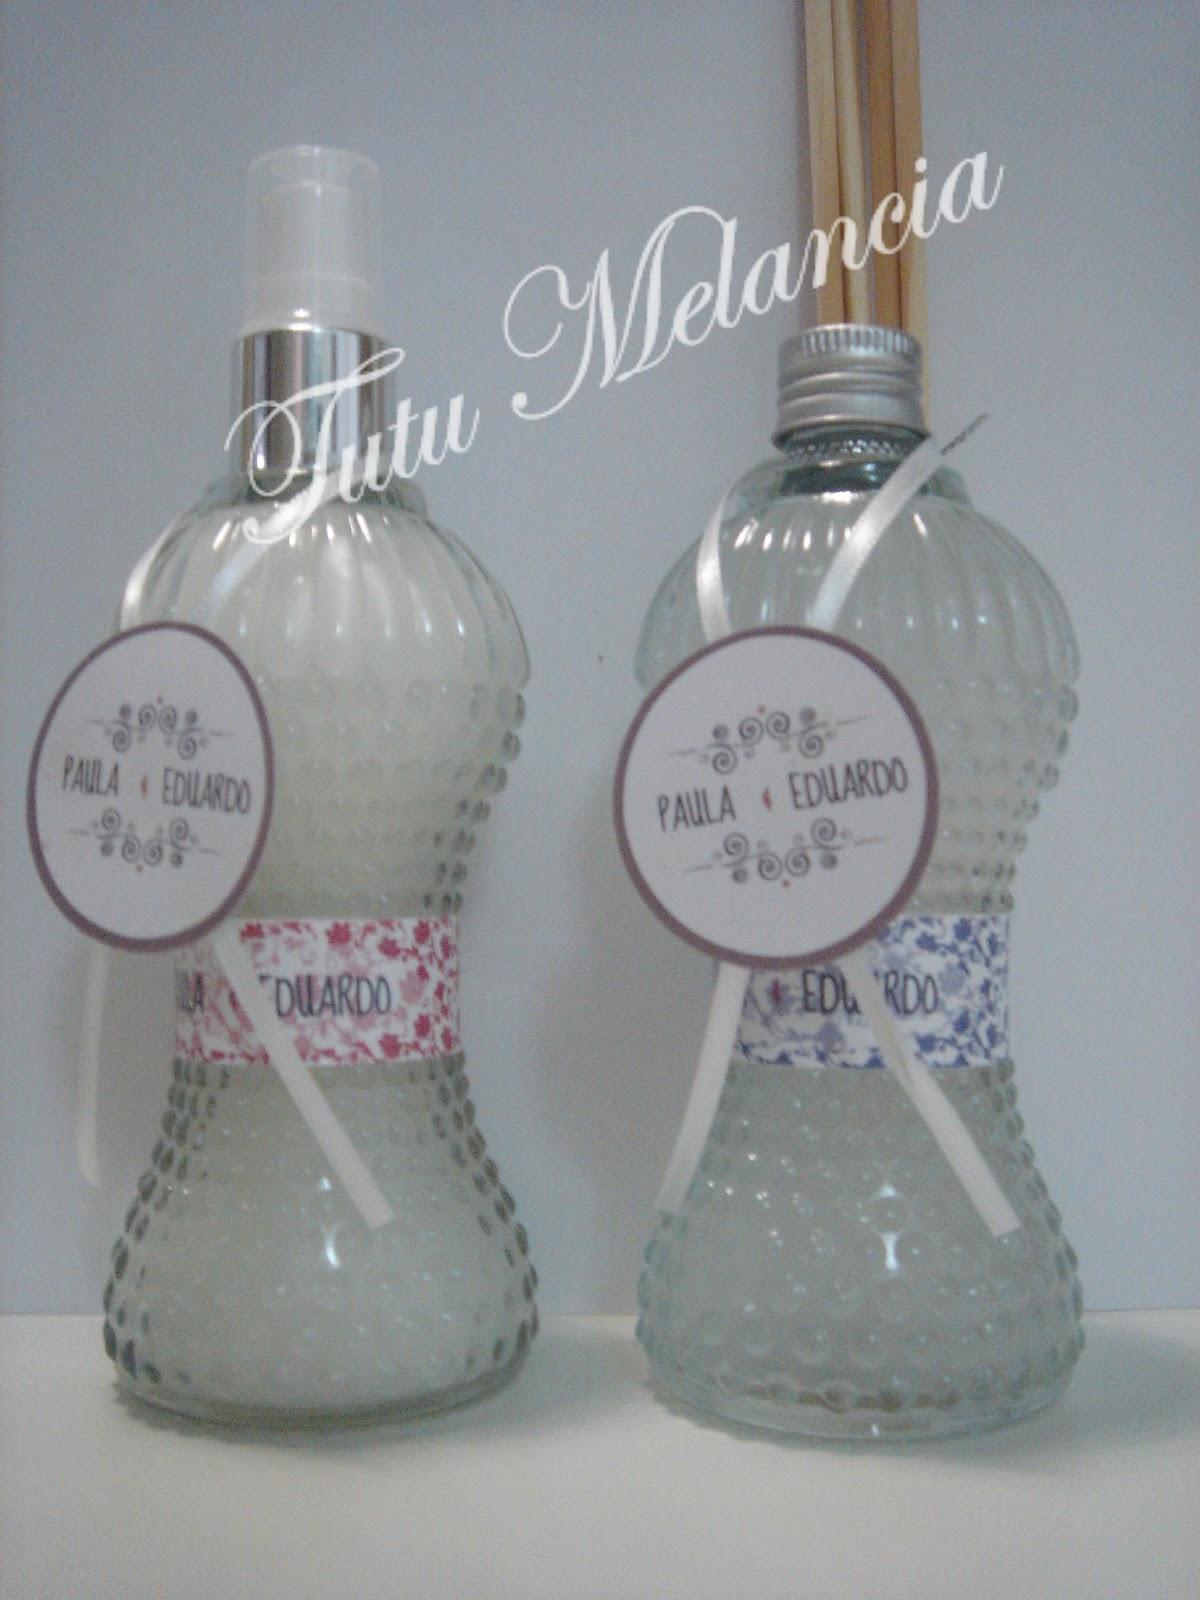 Melancia Lembrancinhas Personalizadas: Kit toillete para Casamento #73614B 1200 1600